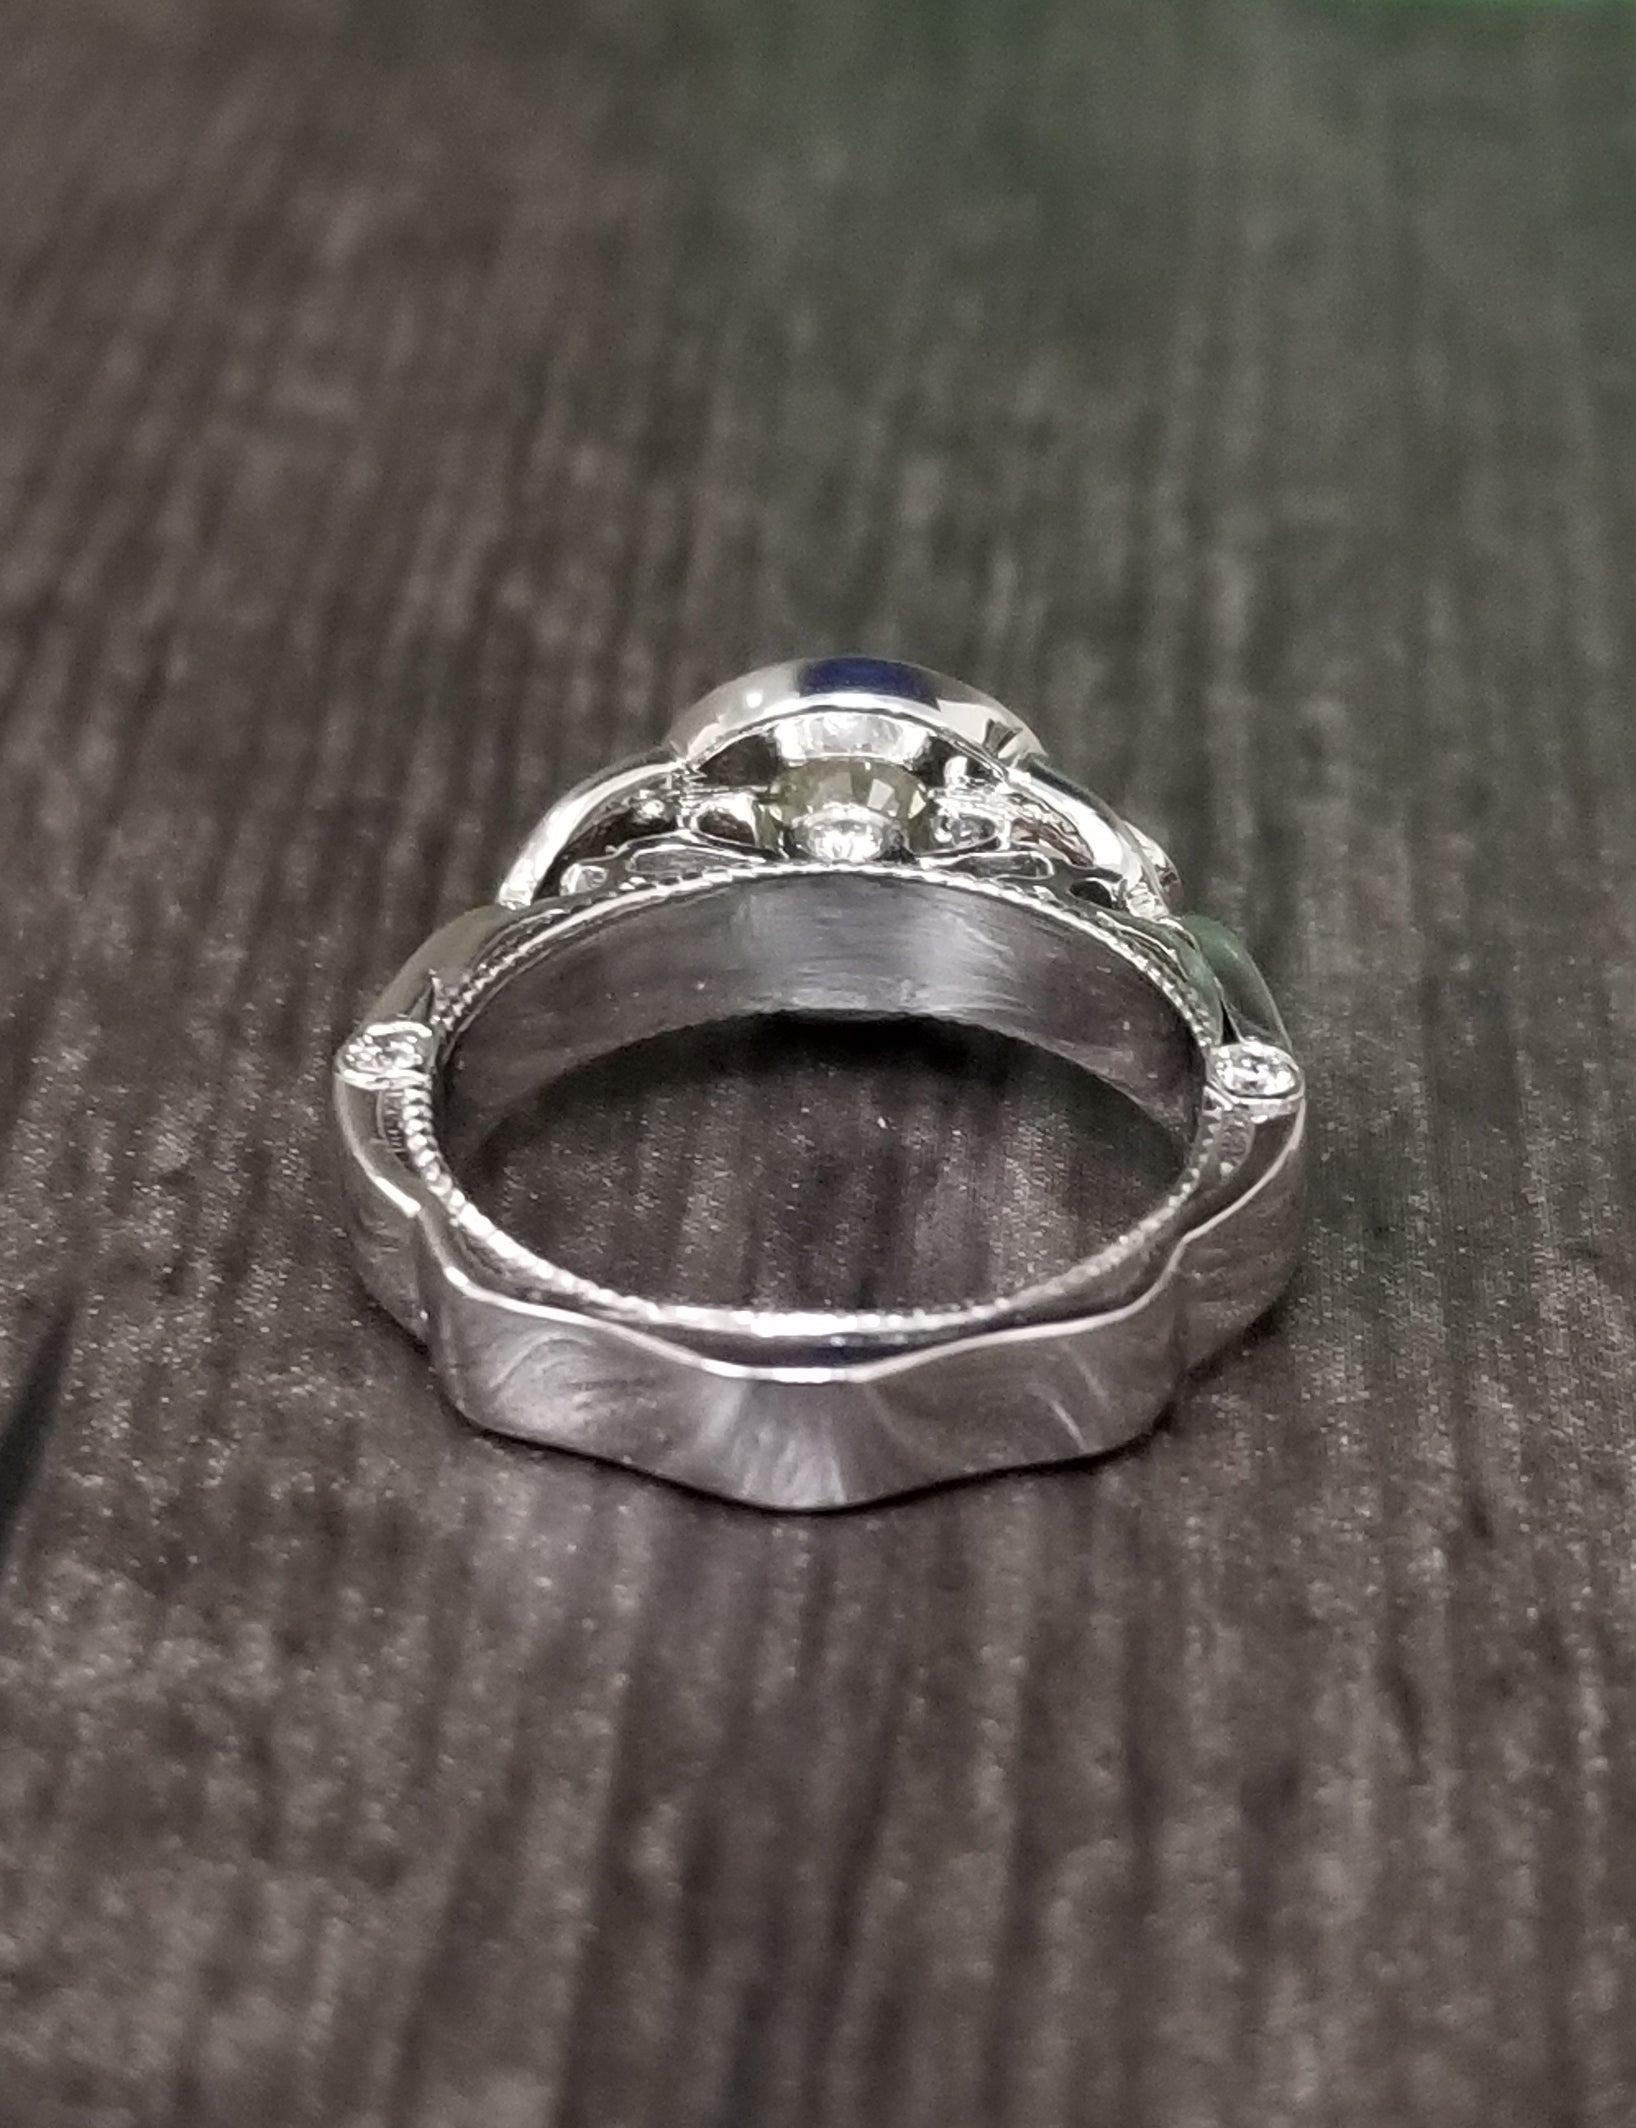 ed7850271 1.38 Carat Brilliant Cut Yellow Diamond Ring For Sale at 1stdibs